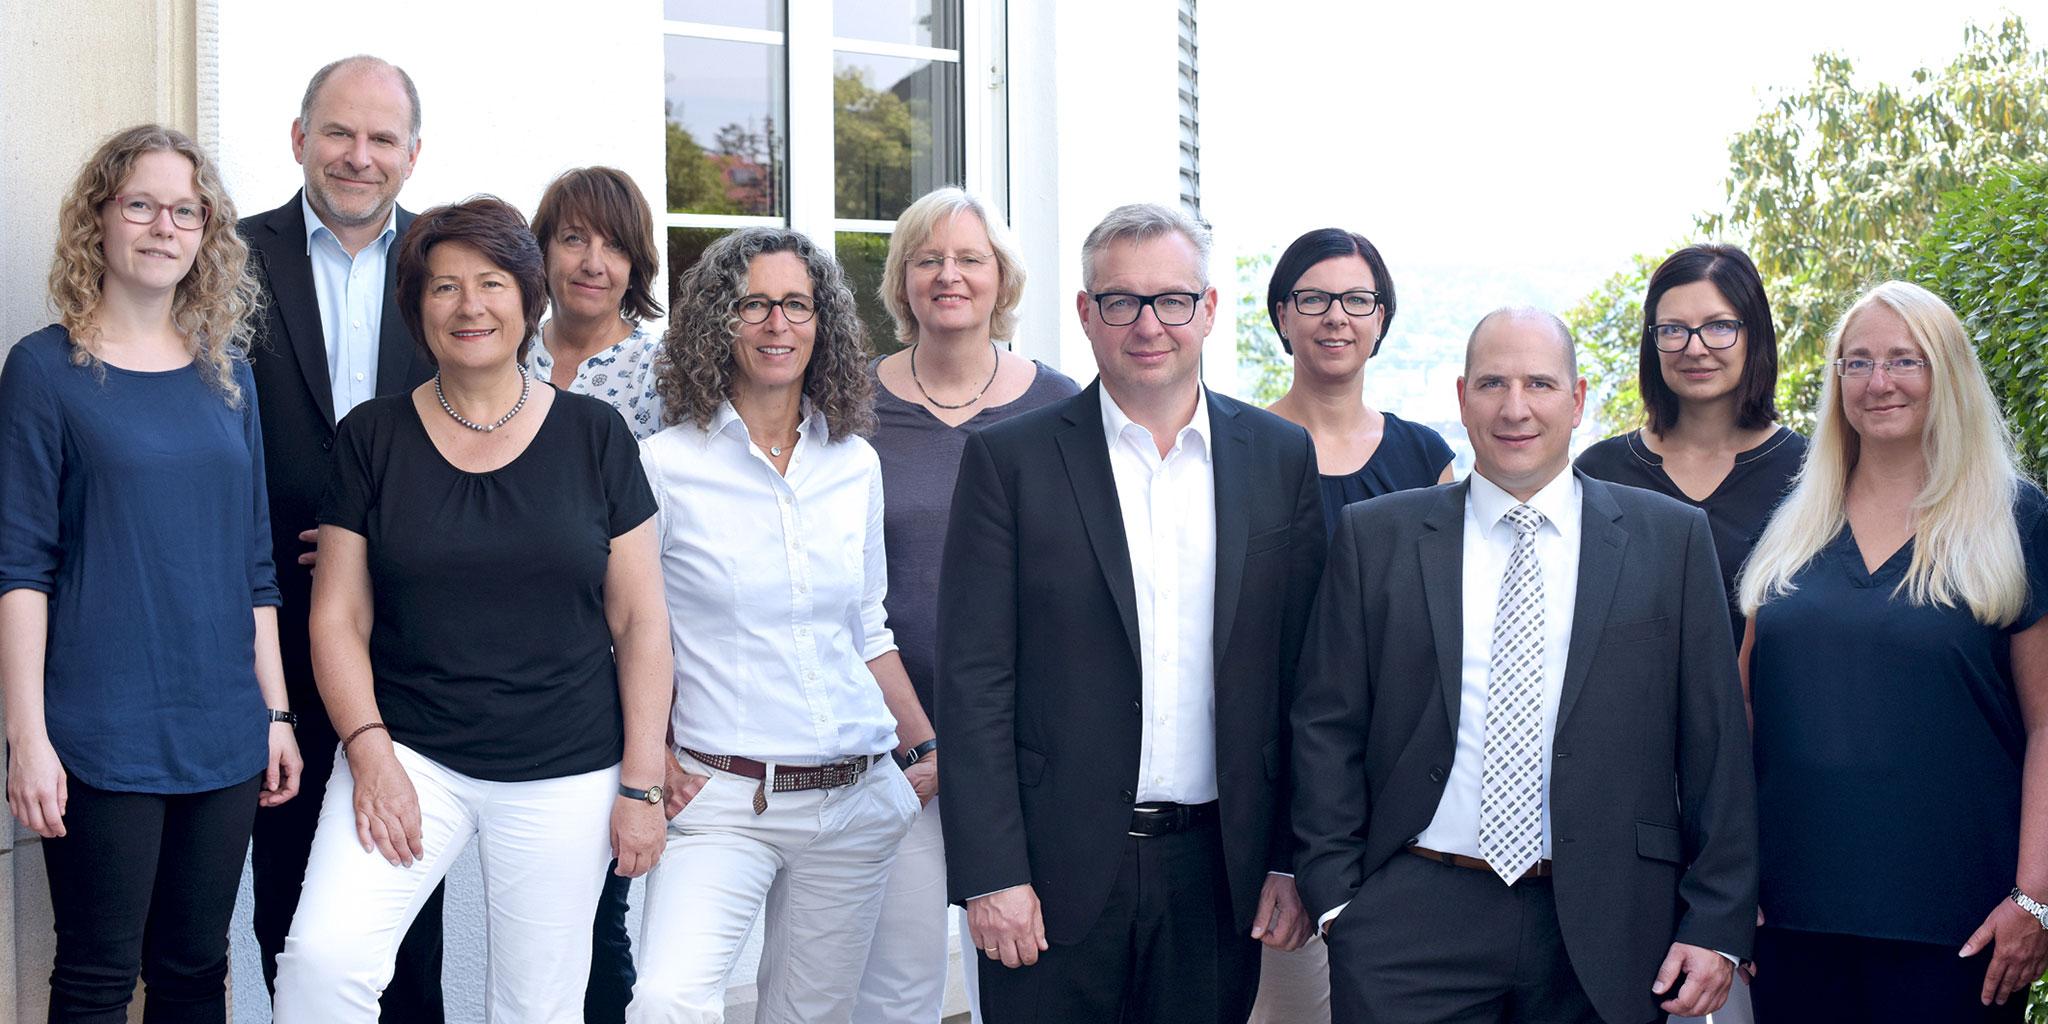 Ihr Steuerberater Team - Dr. Harder & Kollegen, Steuerberatungsgesellschaft mbH, Stuttgart